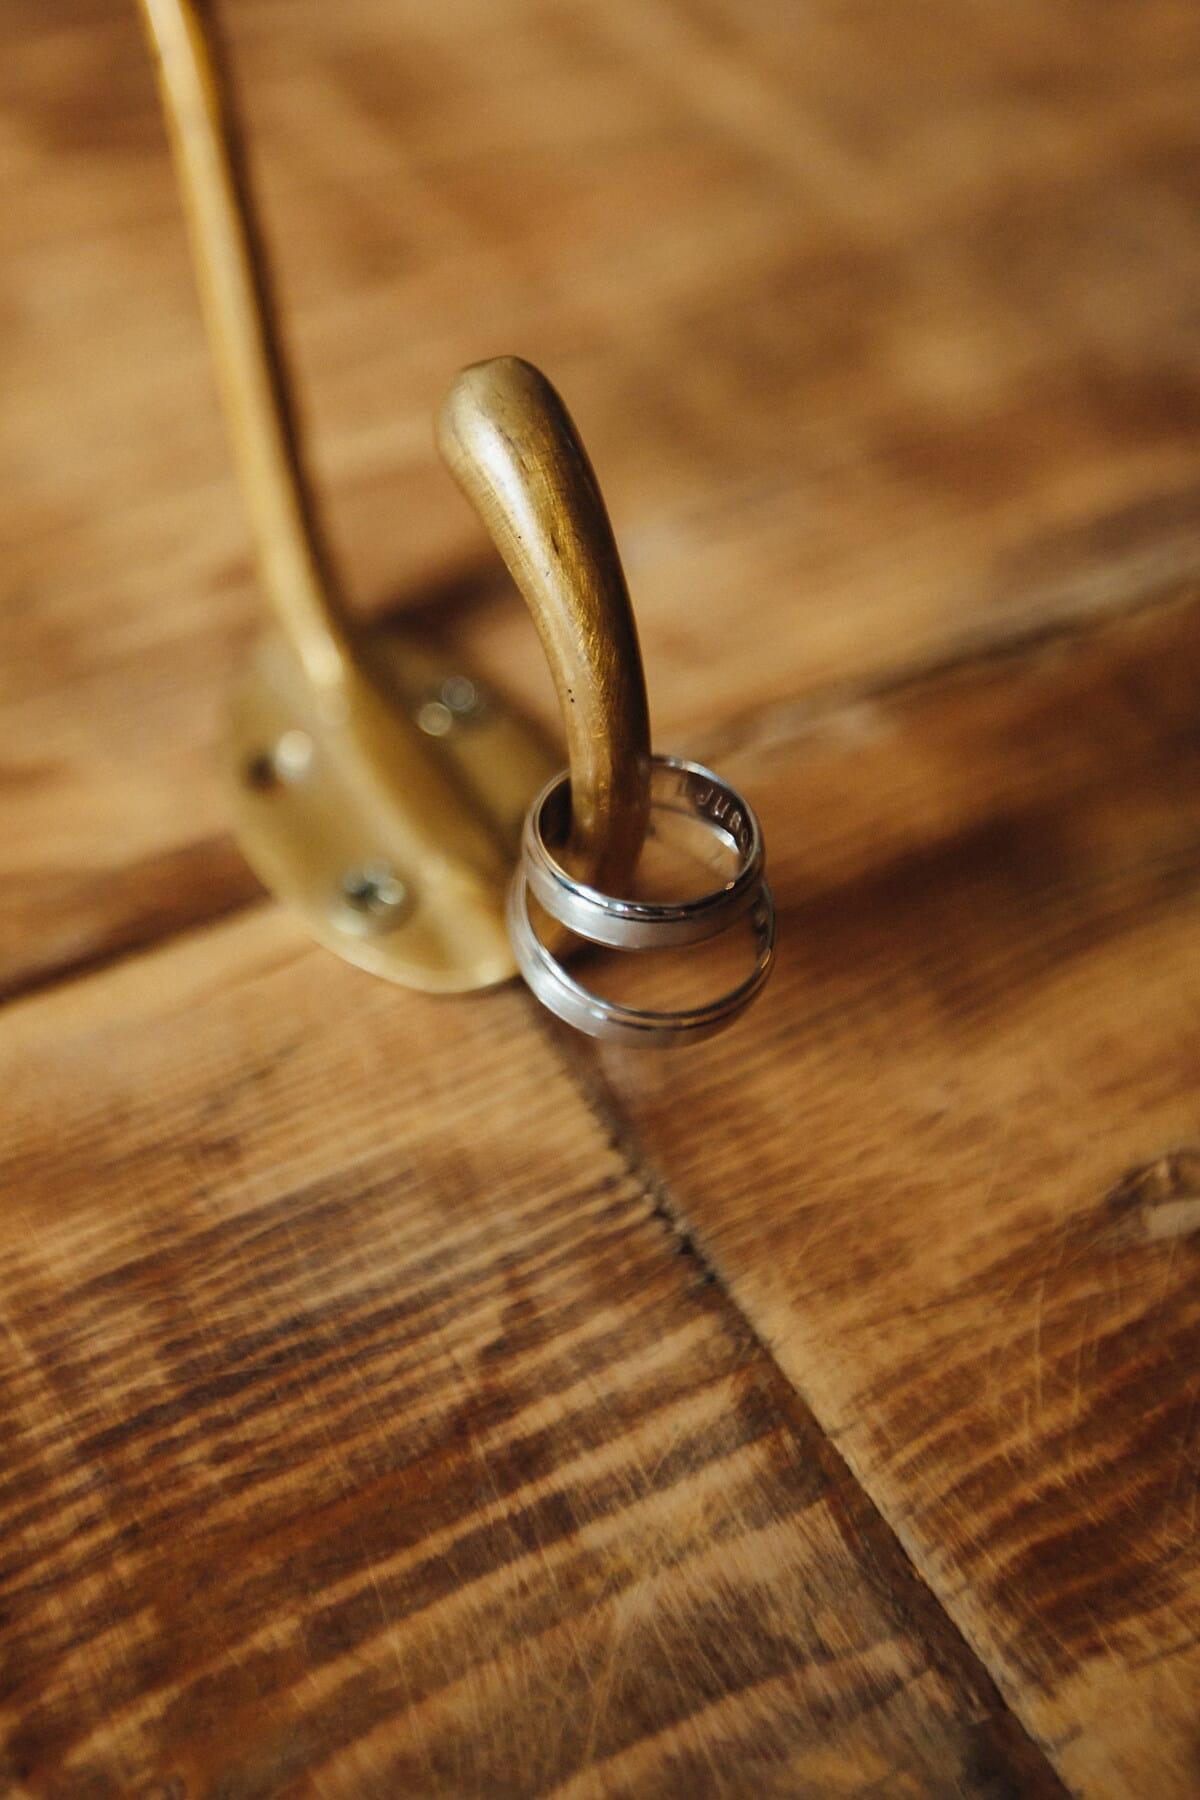 gold, rings, hook, hanger, wedding ring, hanging, wood, old, retro, vintage